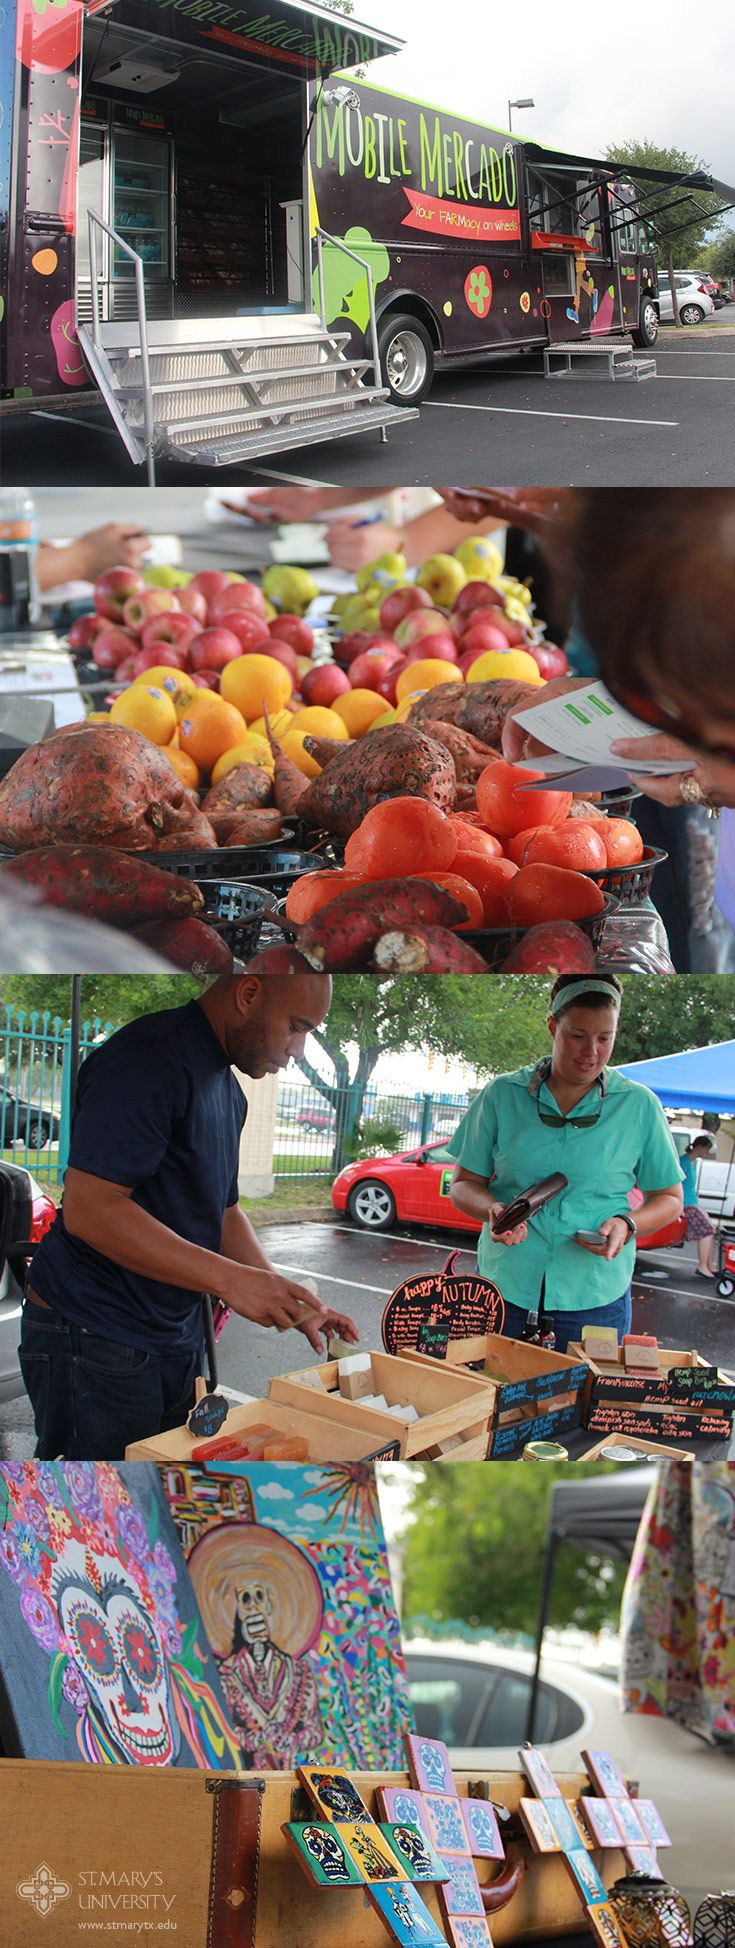 San Antonio Food Bank's Mobile Mercado brought fresh